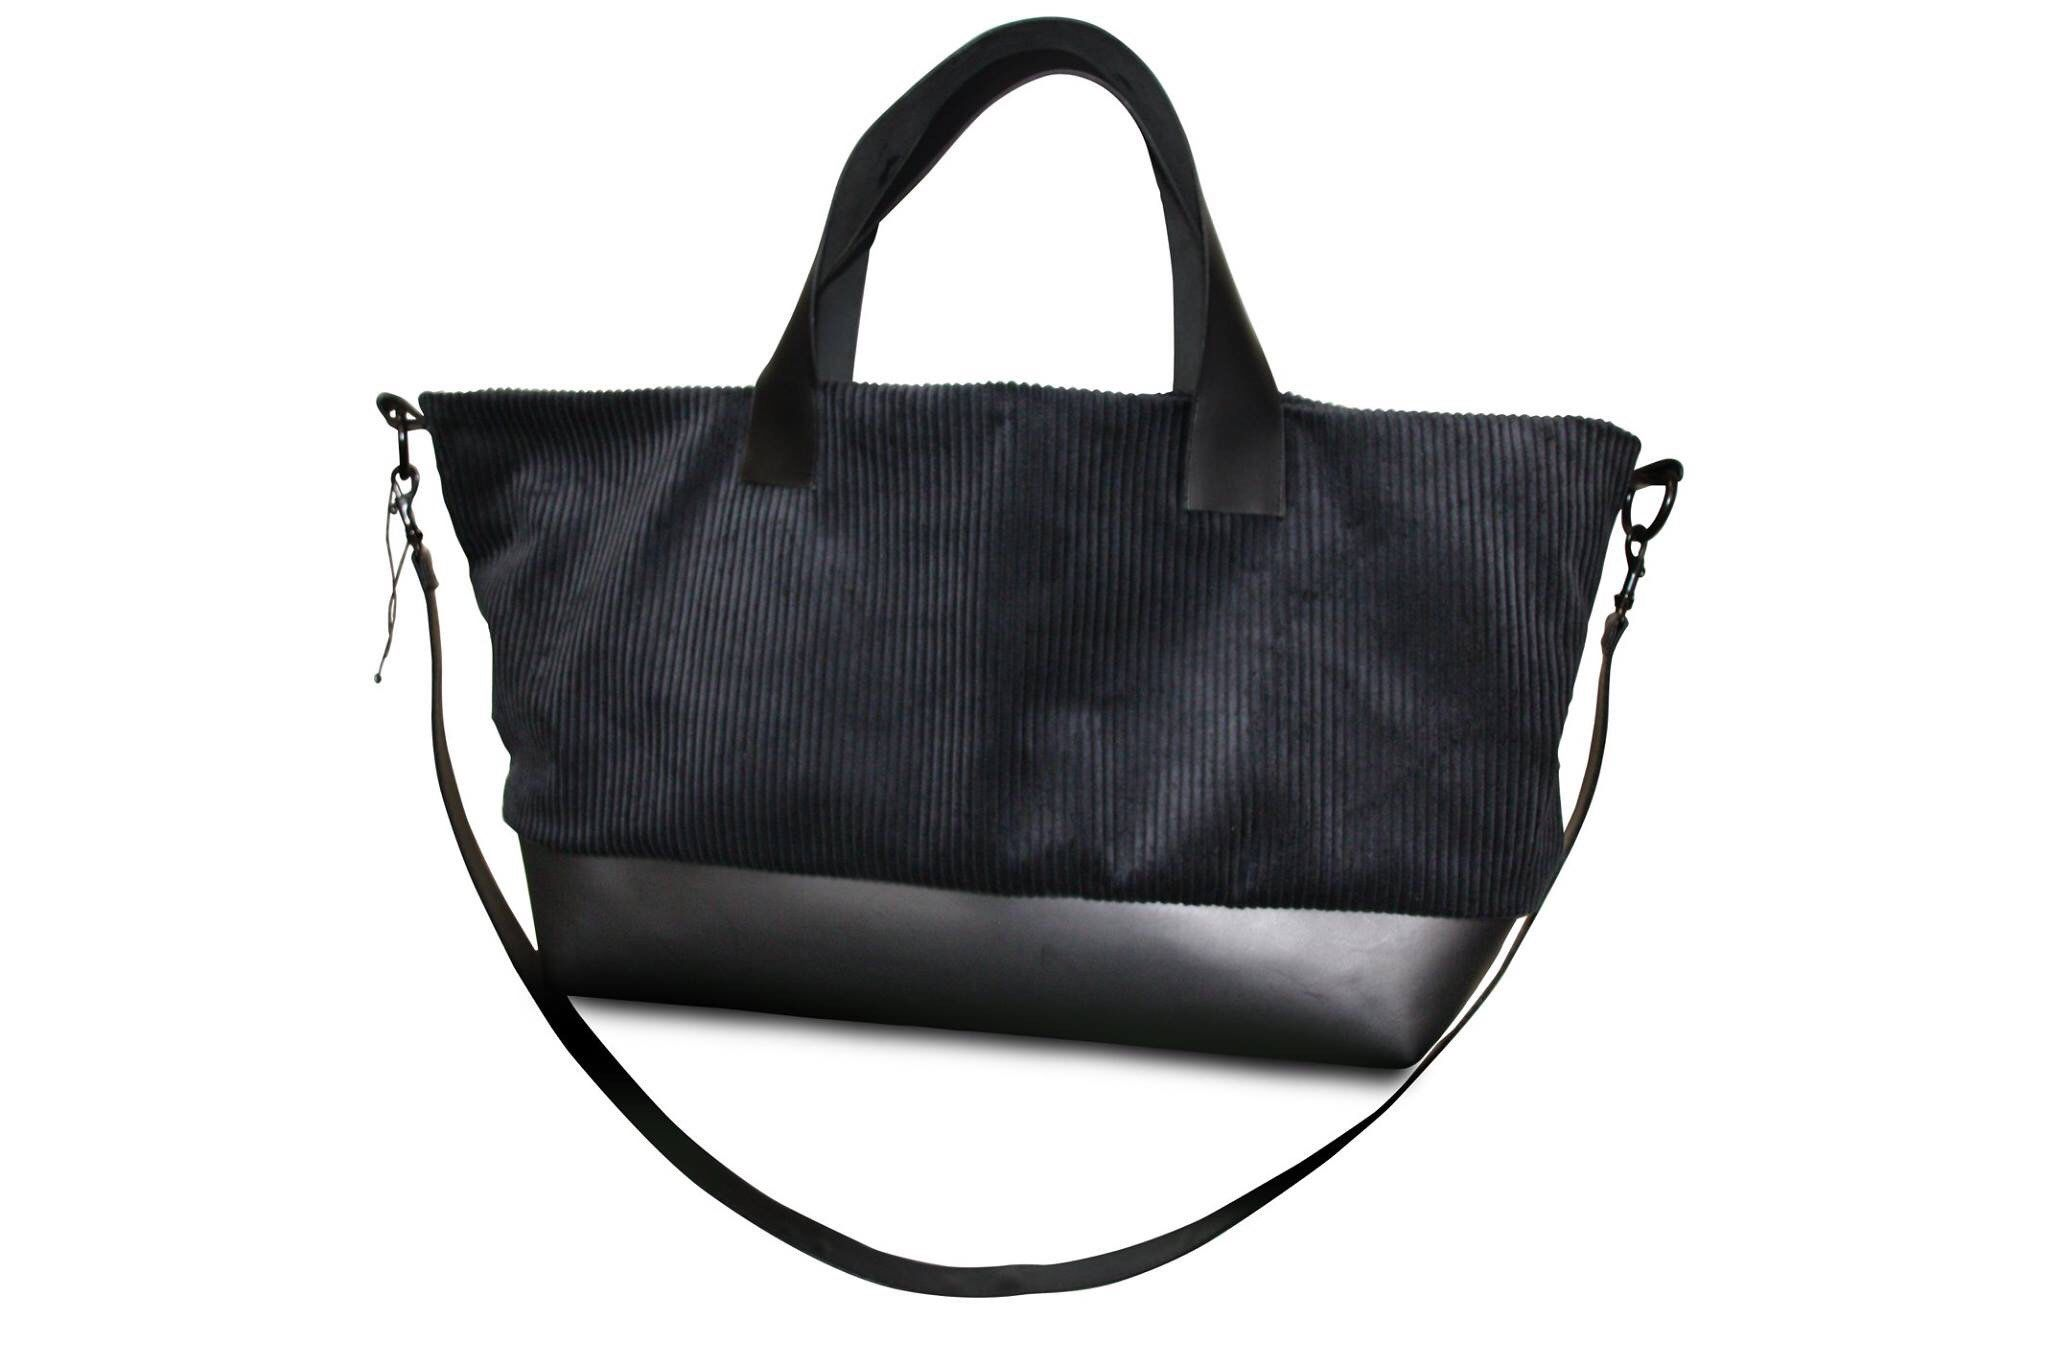 Cord Schwarze Leder Tote Bag Tasche HDW2IeY9E